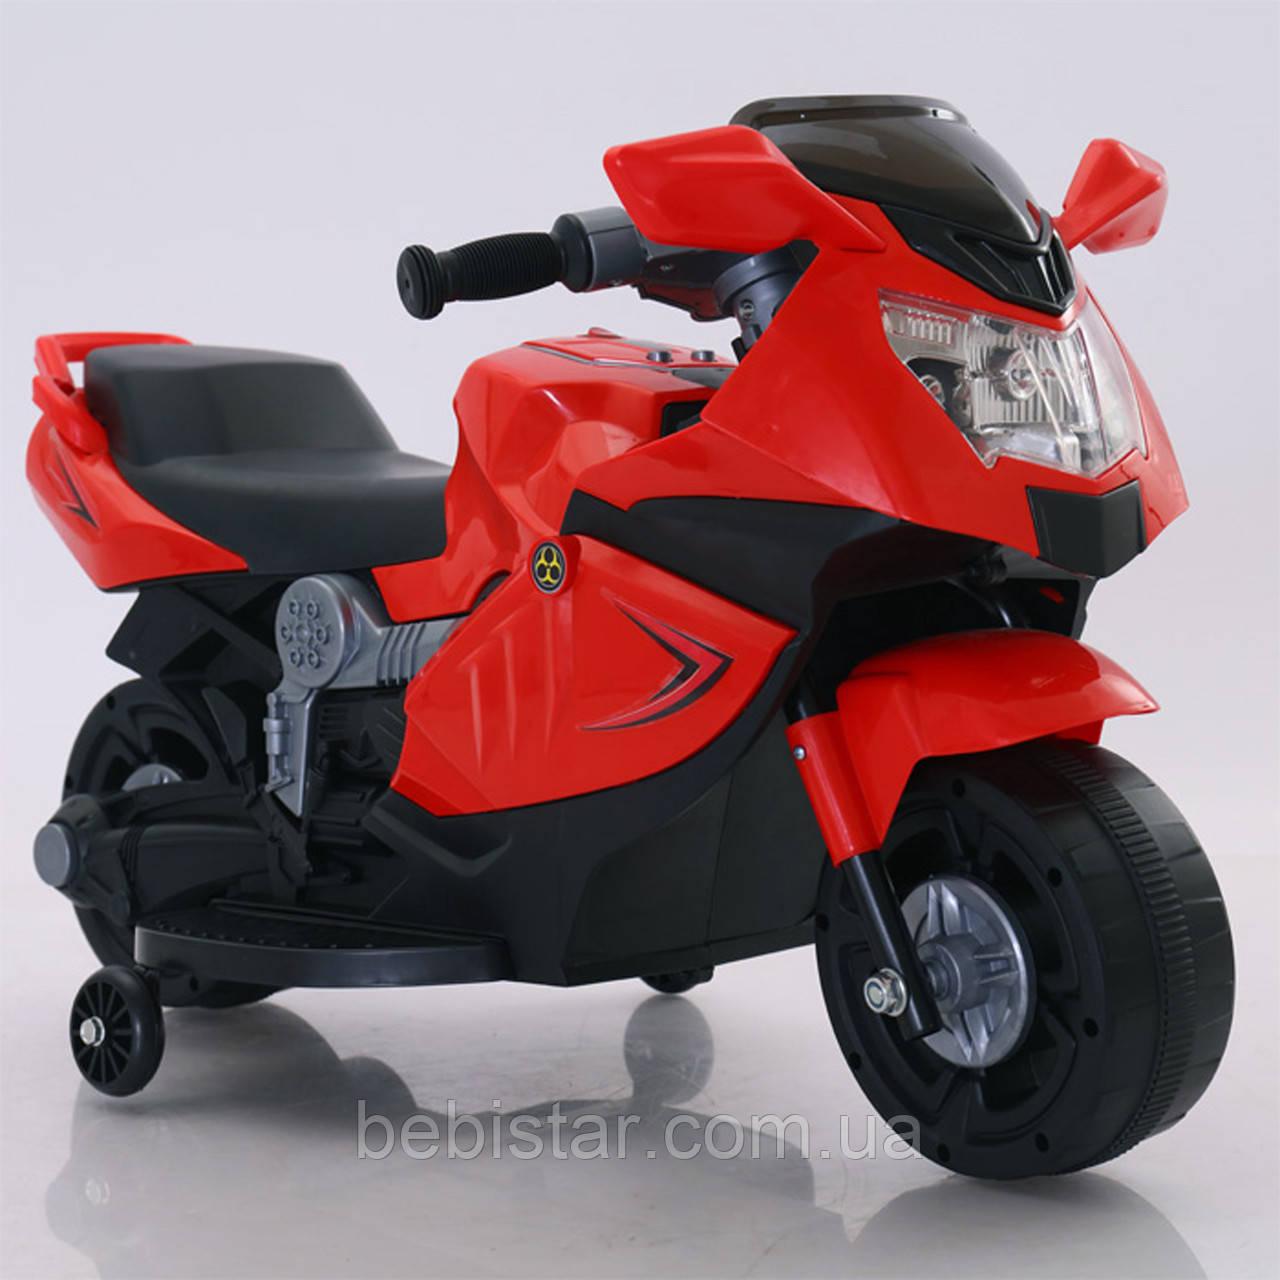 Детский электромобиль мотоцикл красный от 2 до 4-х лет до 25кг мотор 1*12W размер 86х44х52см